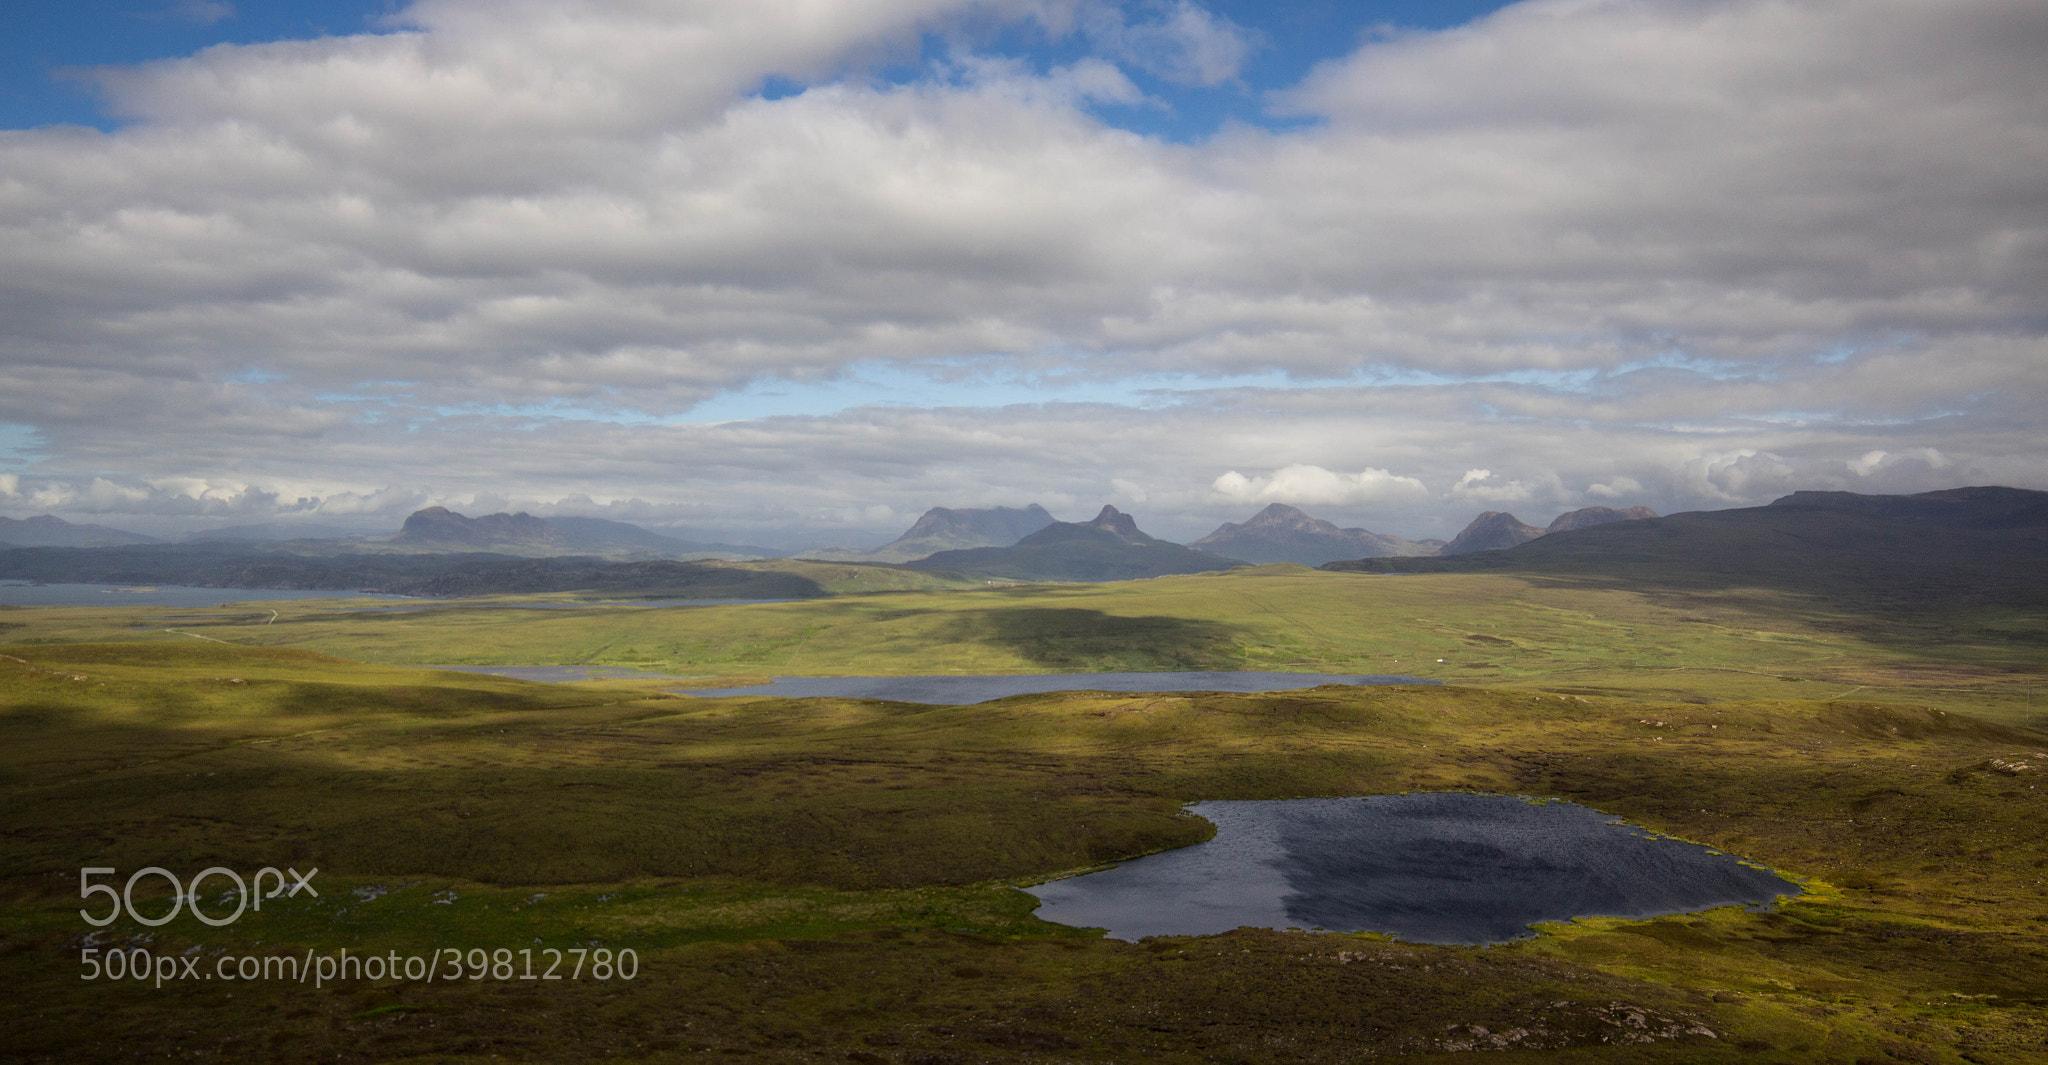 Photograph Highland Mountain Range by Dan James on 500px